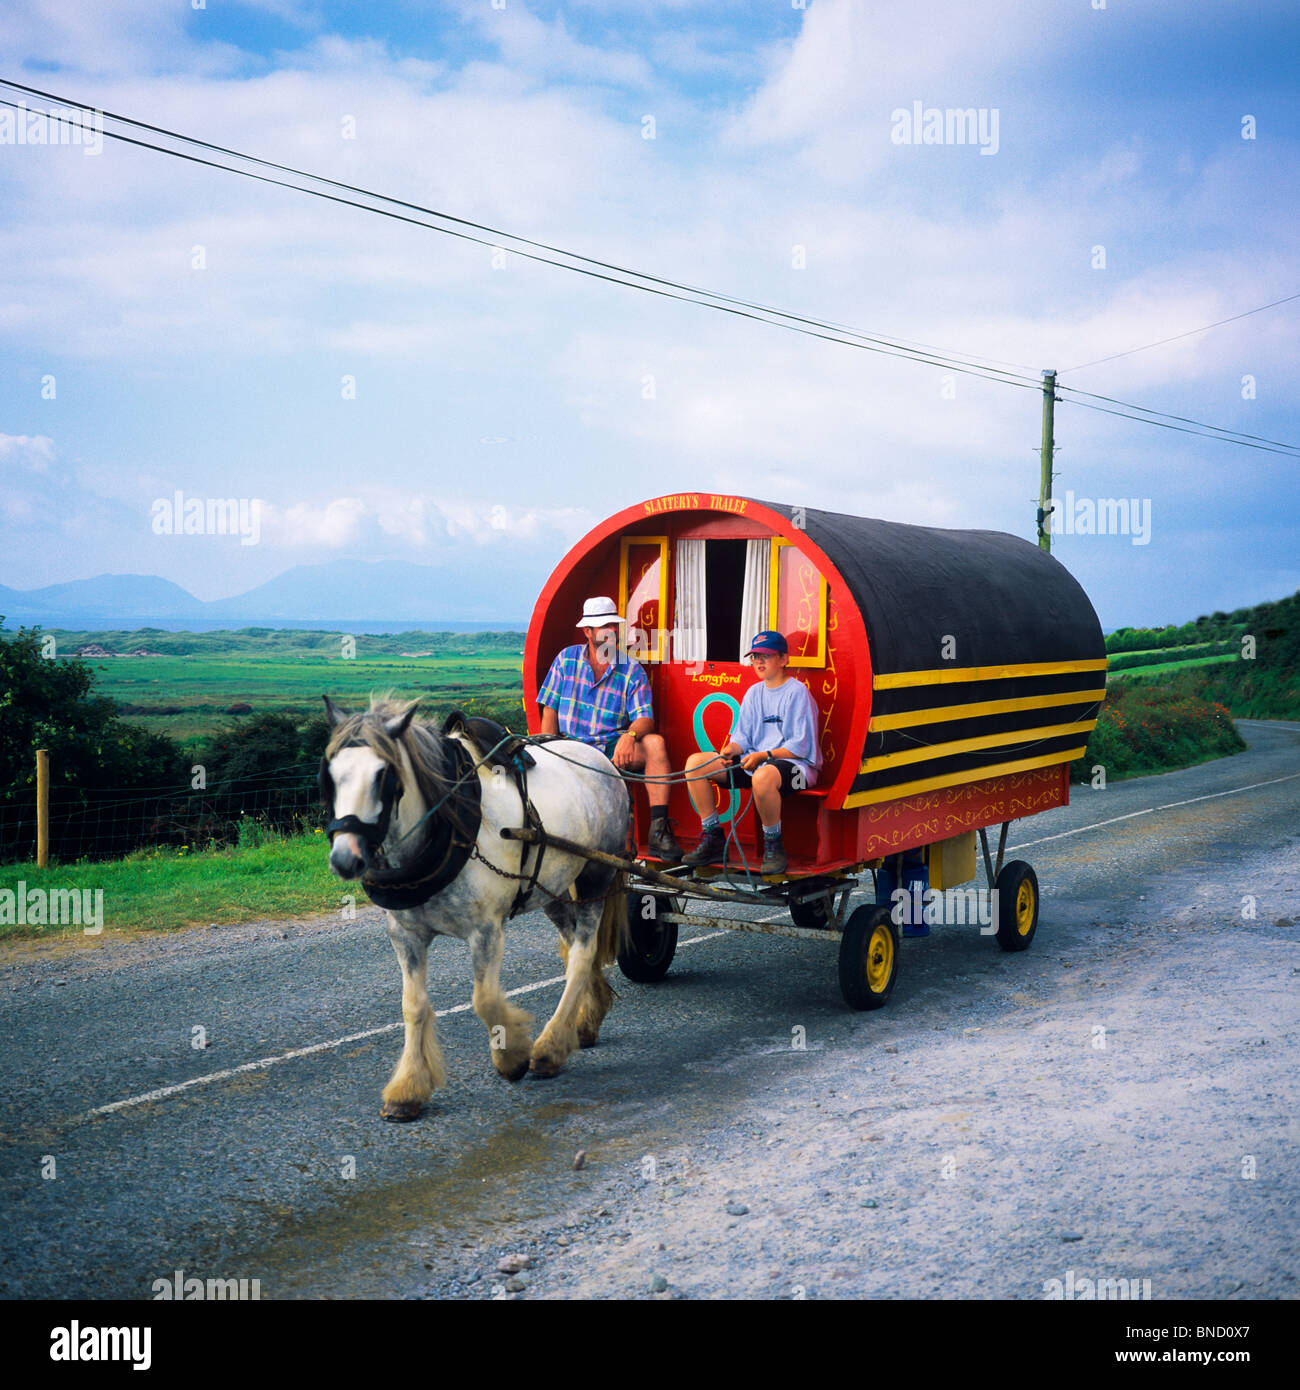 HORSE-DRAWN CARAVAN CONNEMARA COUNTY GALWAY IRELAND - Stock Image